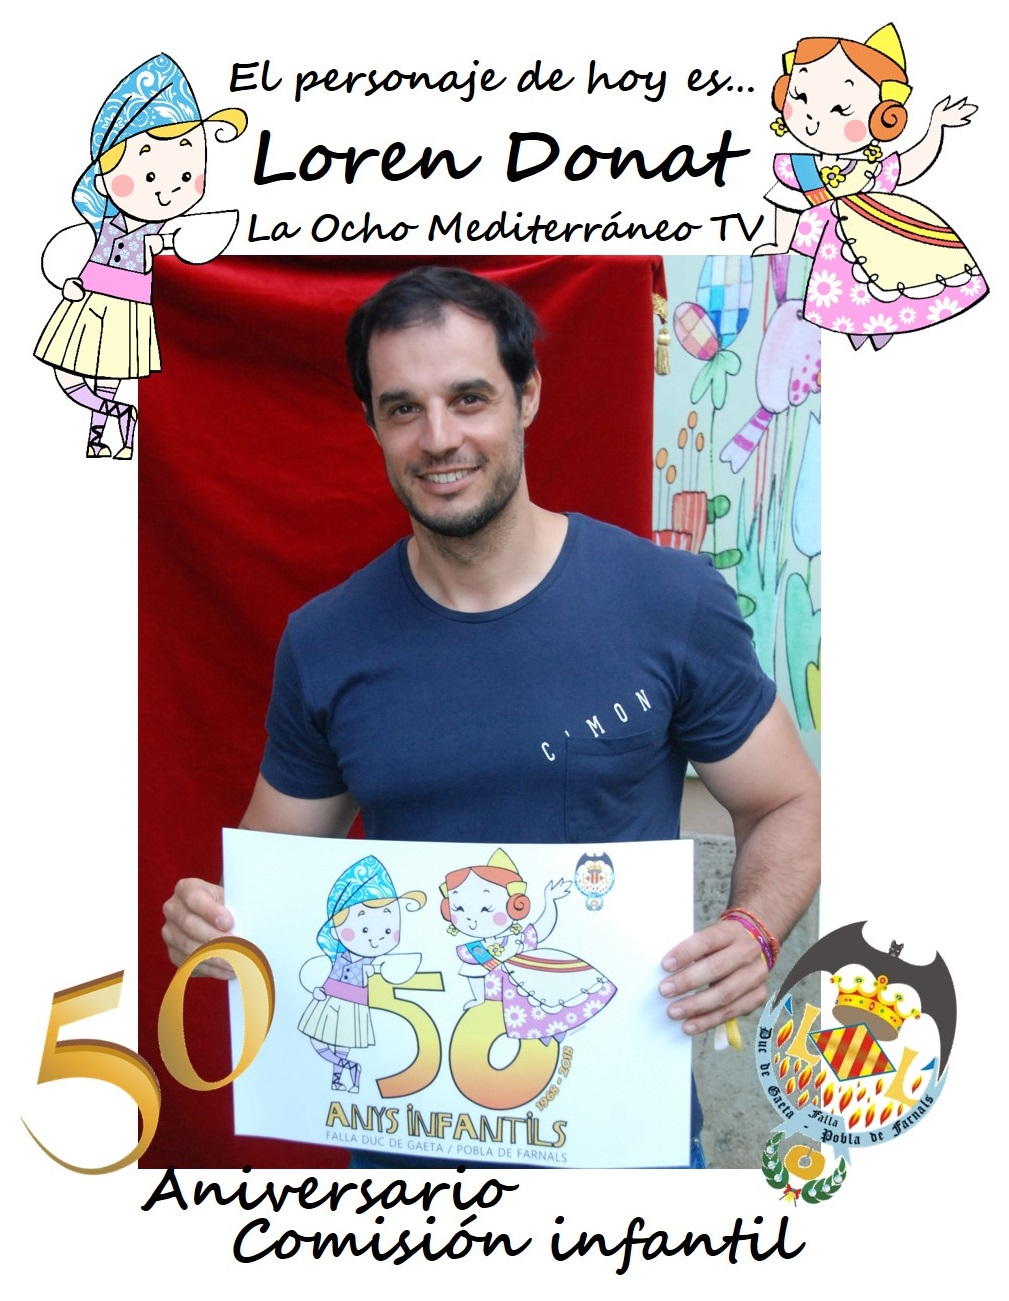 Personaje del día: Loren Donat